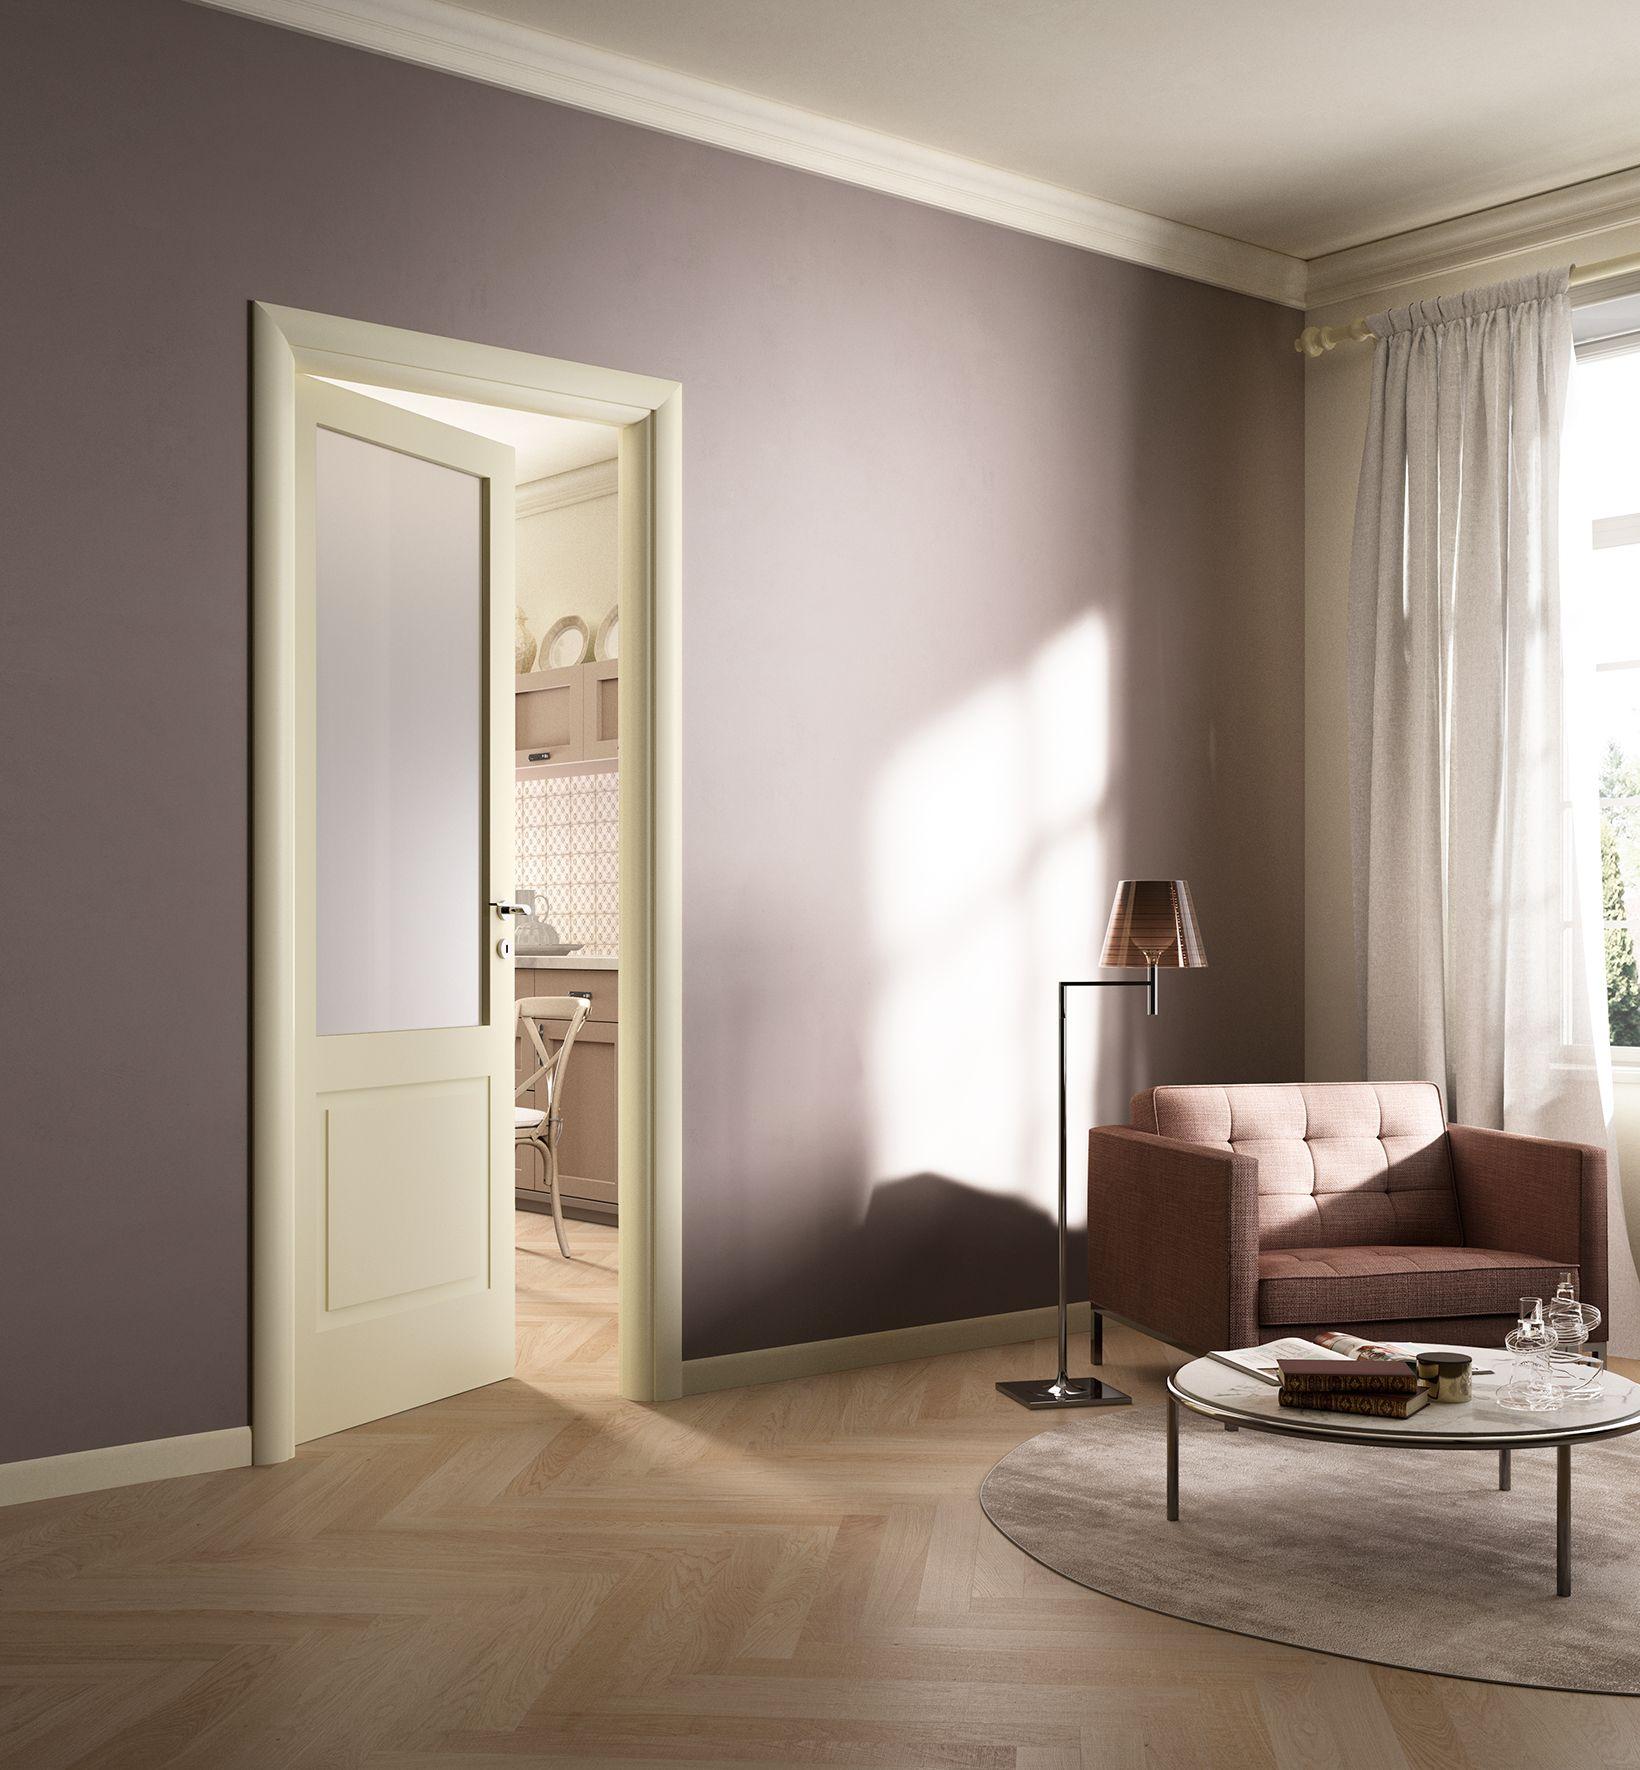 Porta Suite 6 cremy FerreroLegno   Suite FerreroLegno   Pinterest ...